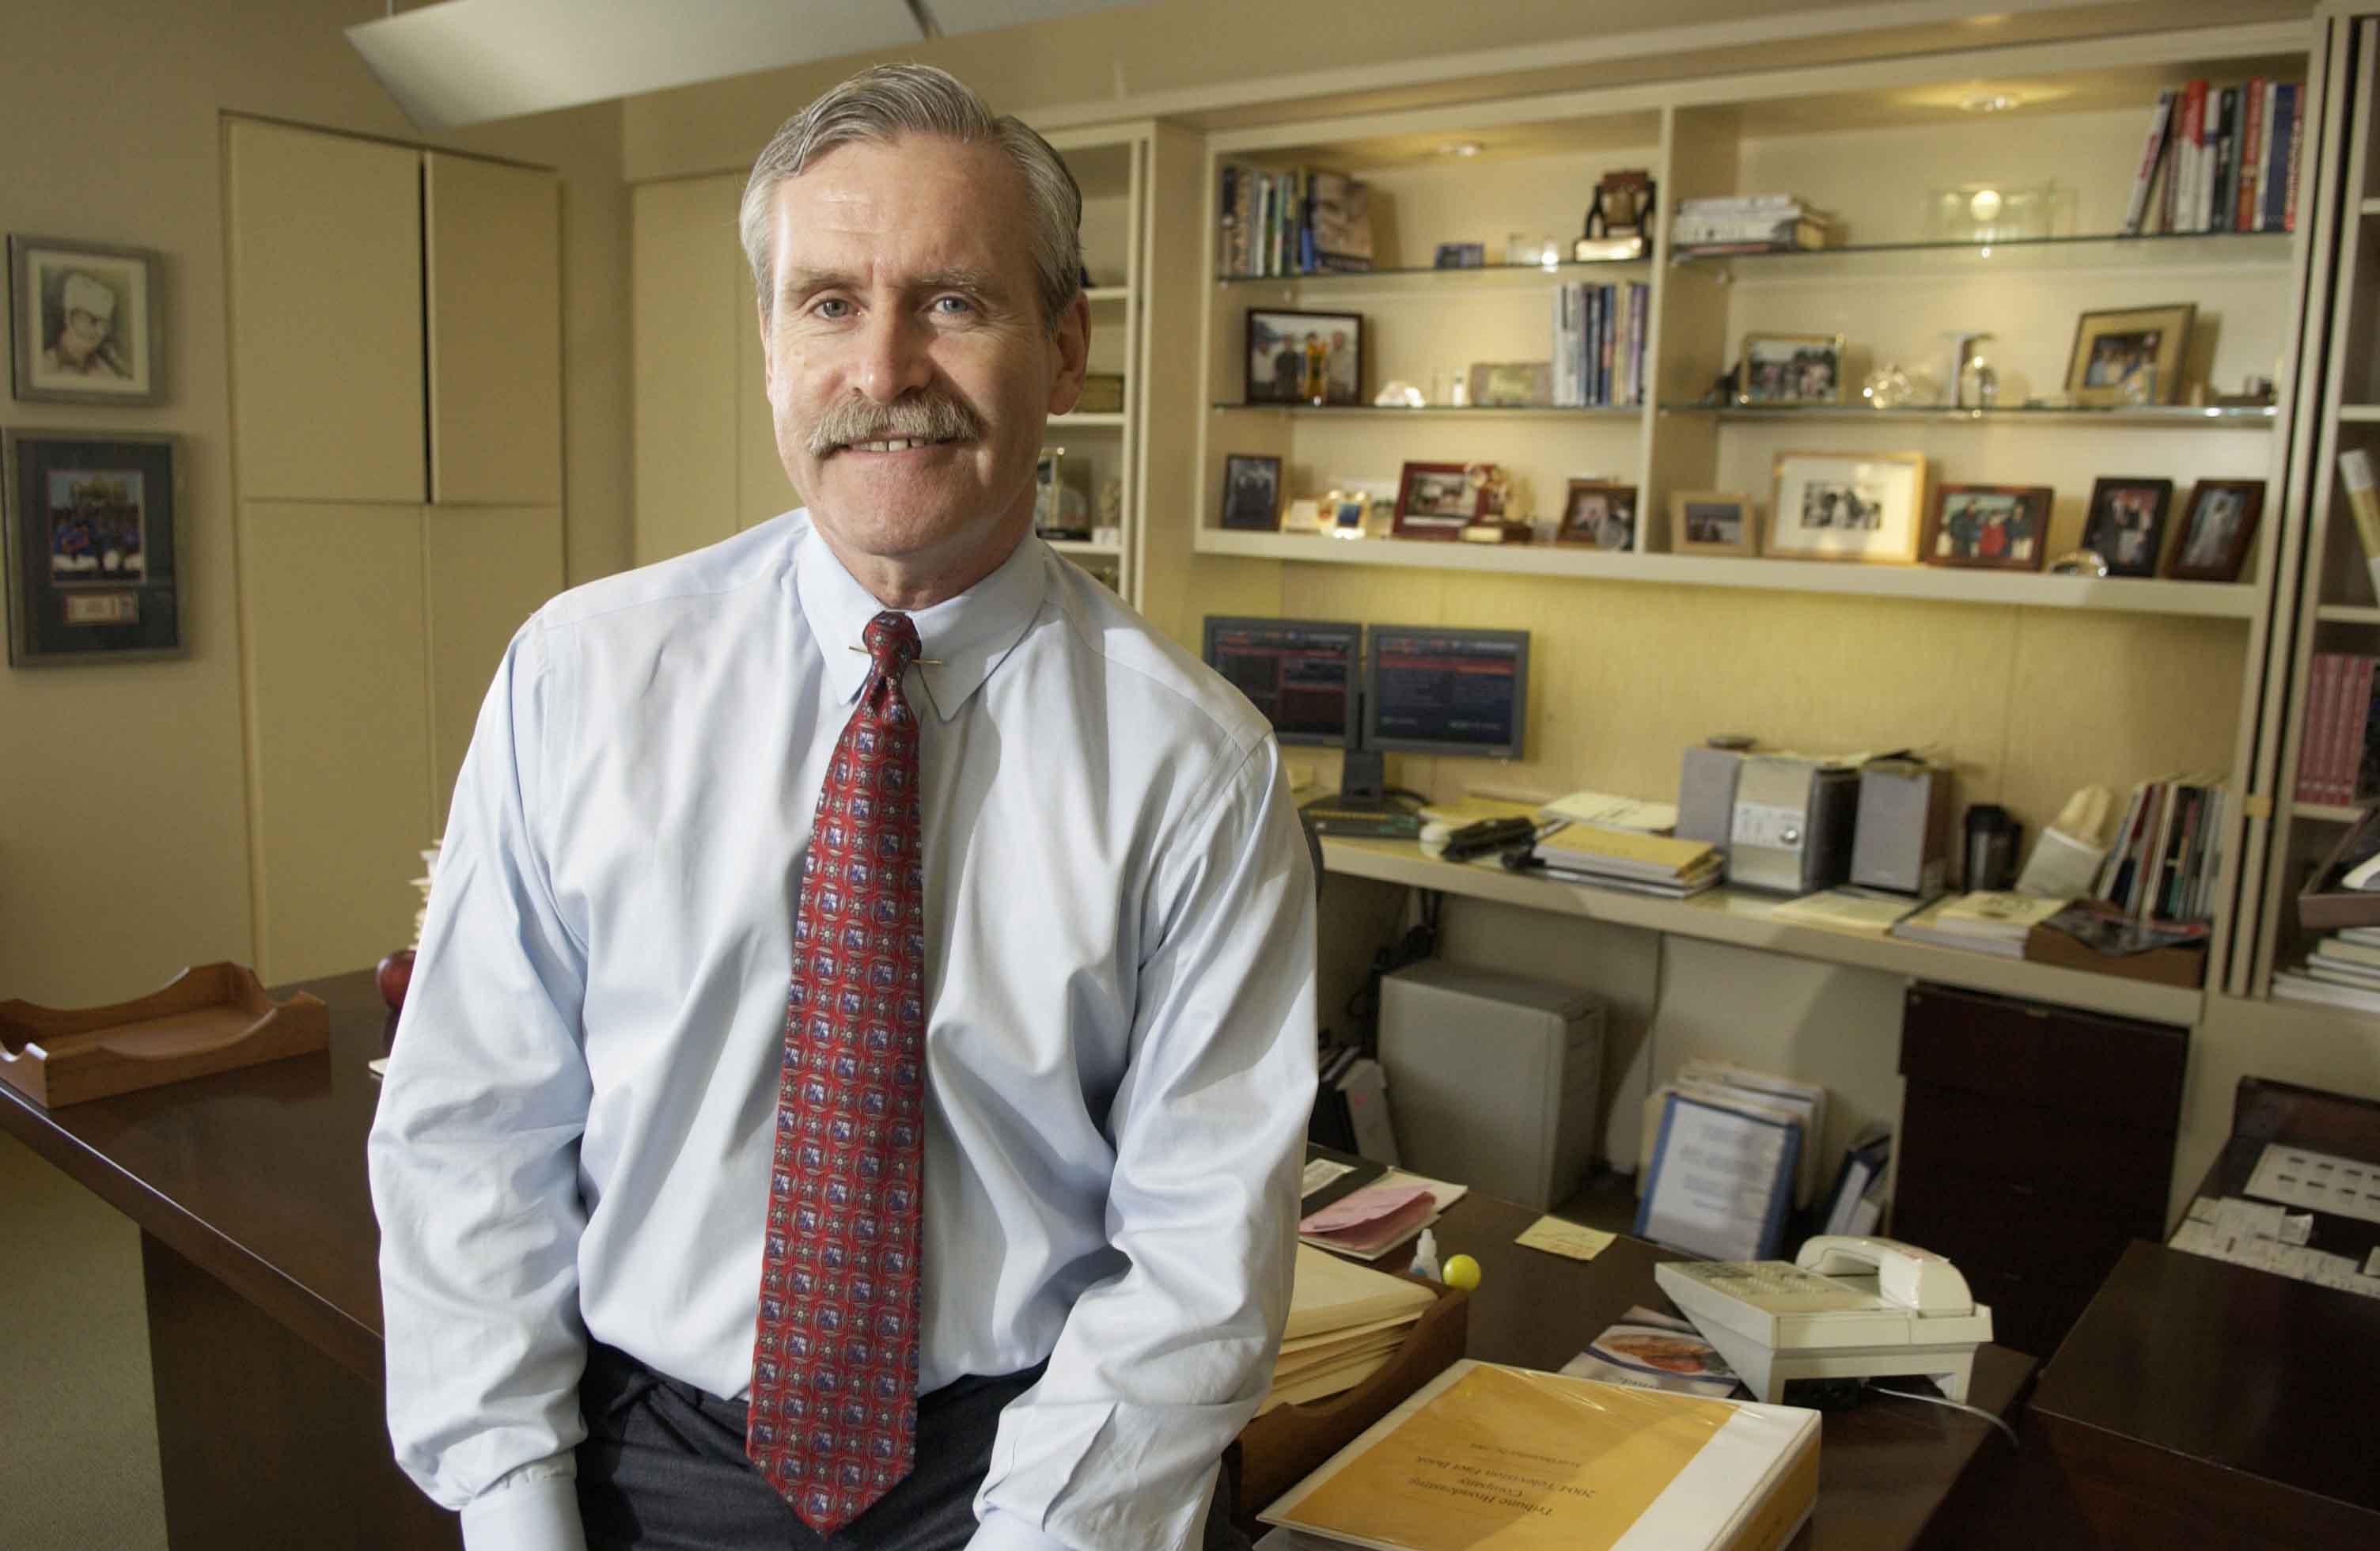 Office/environmental portrait of Dennis FitzSimons. (Bill Hogan/Chicago Tribune/MCT)